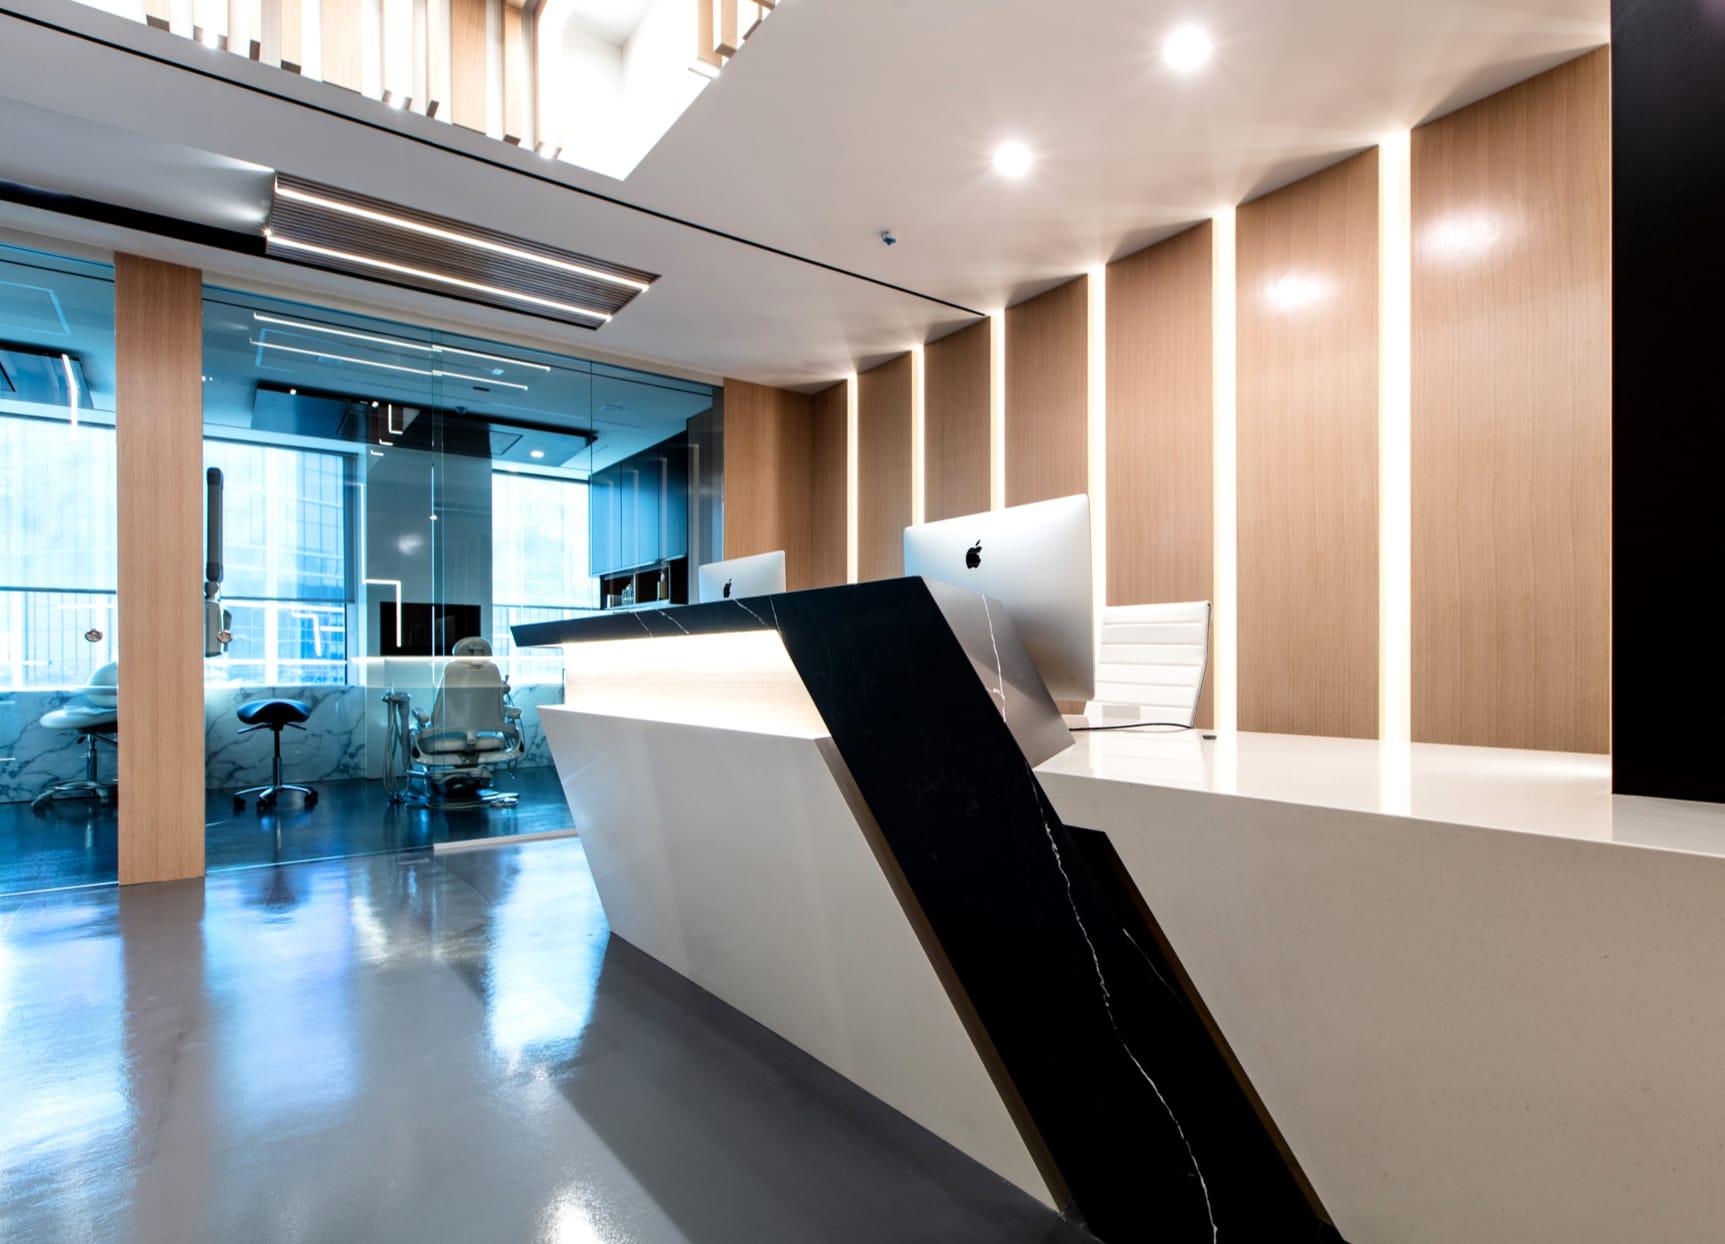 Receptionist desk - clean, modern, sleek lines.